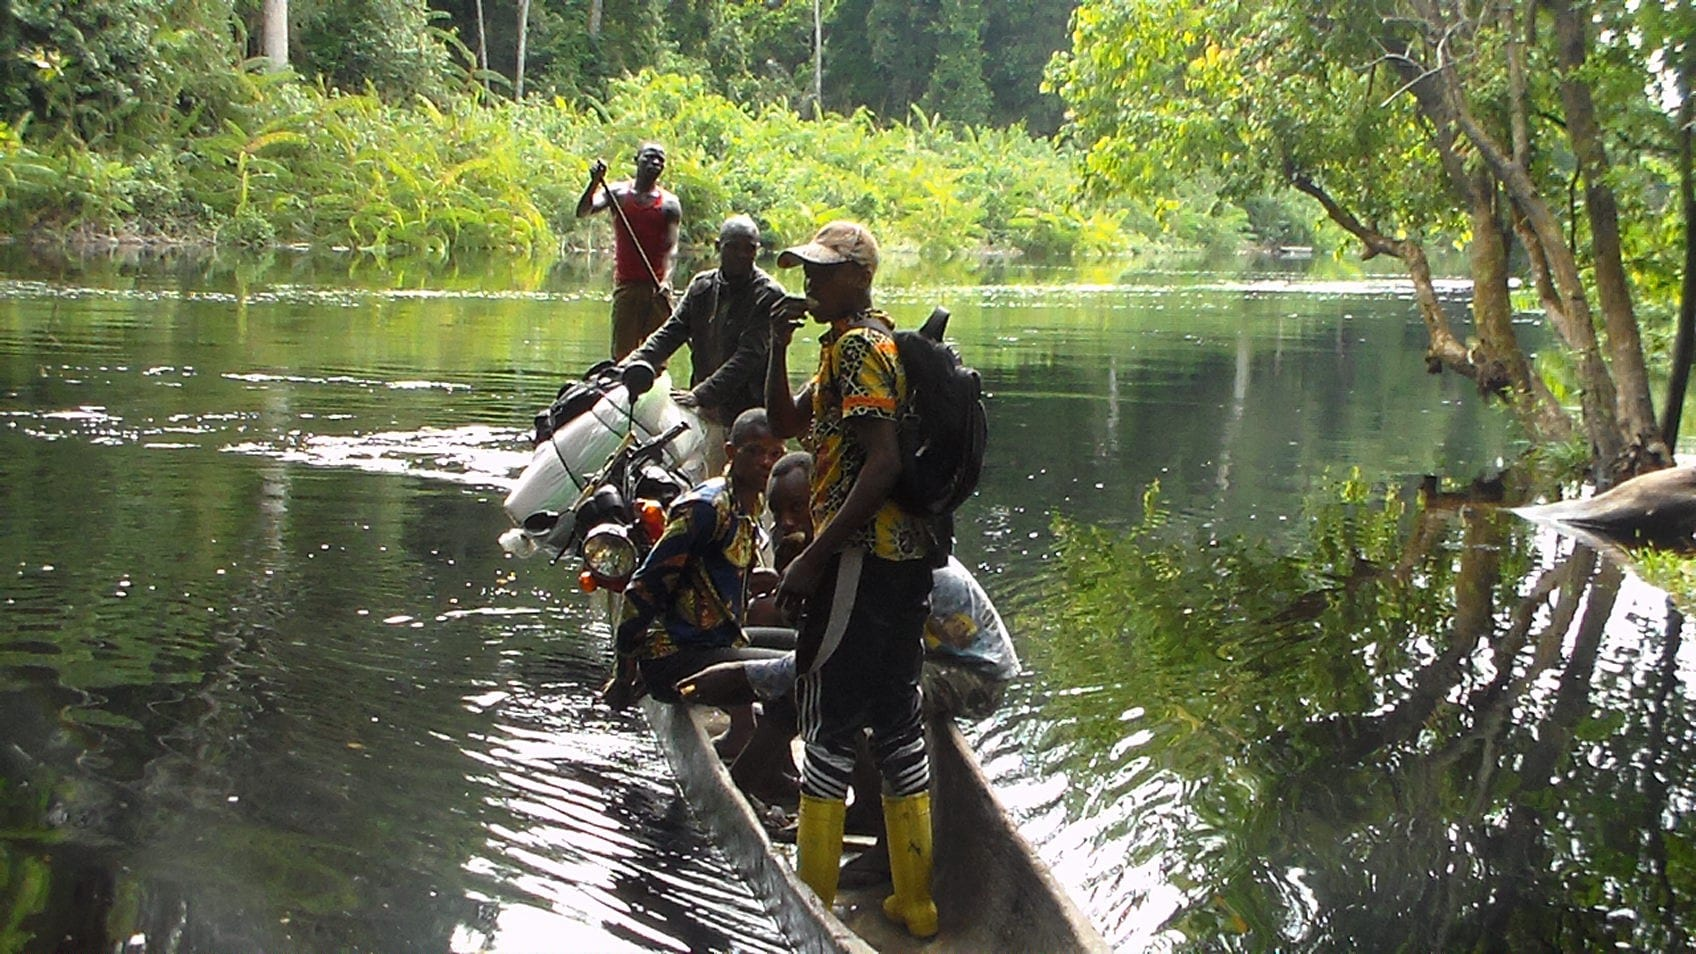 Village Enterprise staff traveling across a river in a canoe